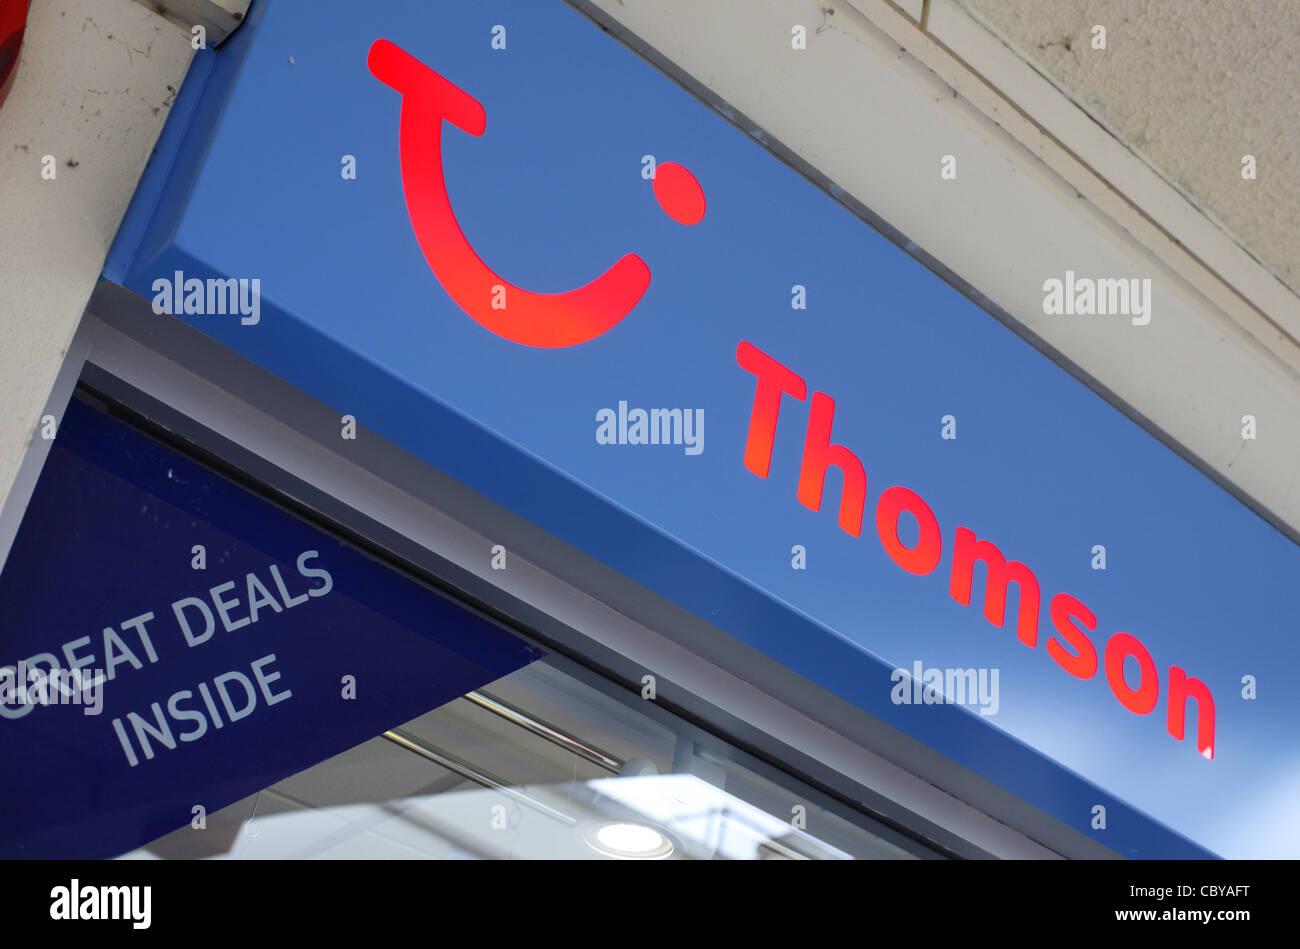 Thomson travel sign - Stock Image